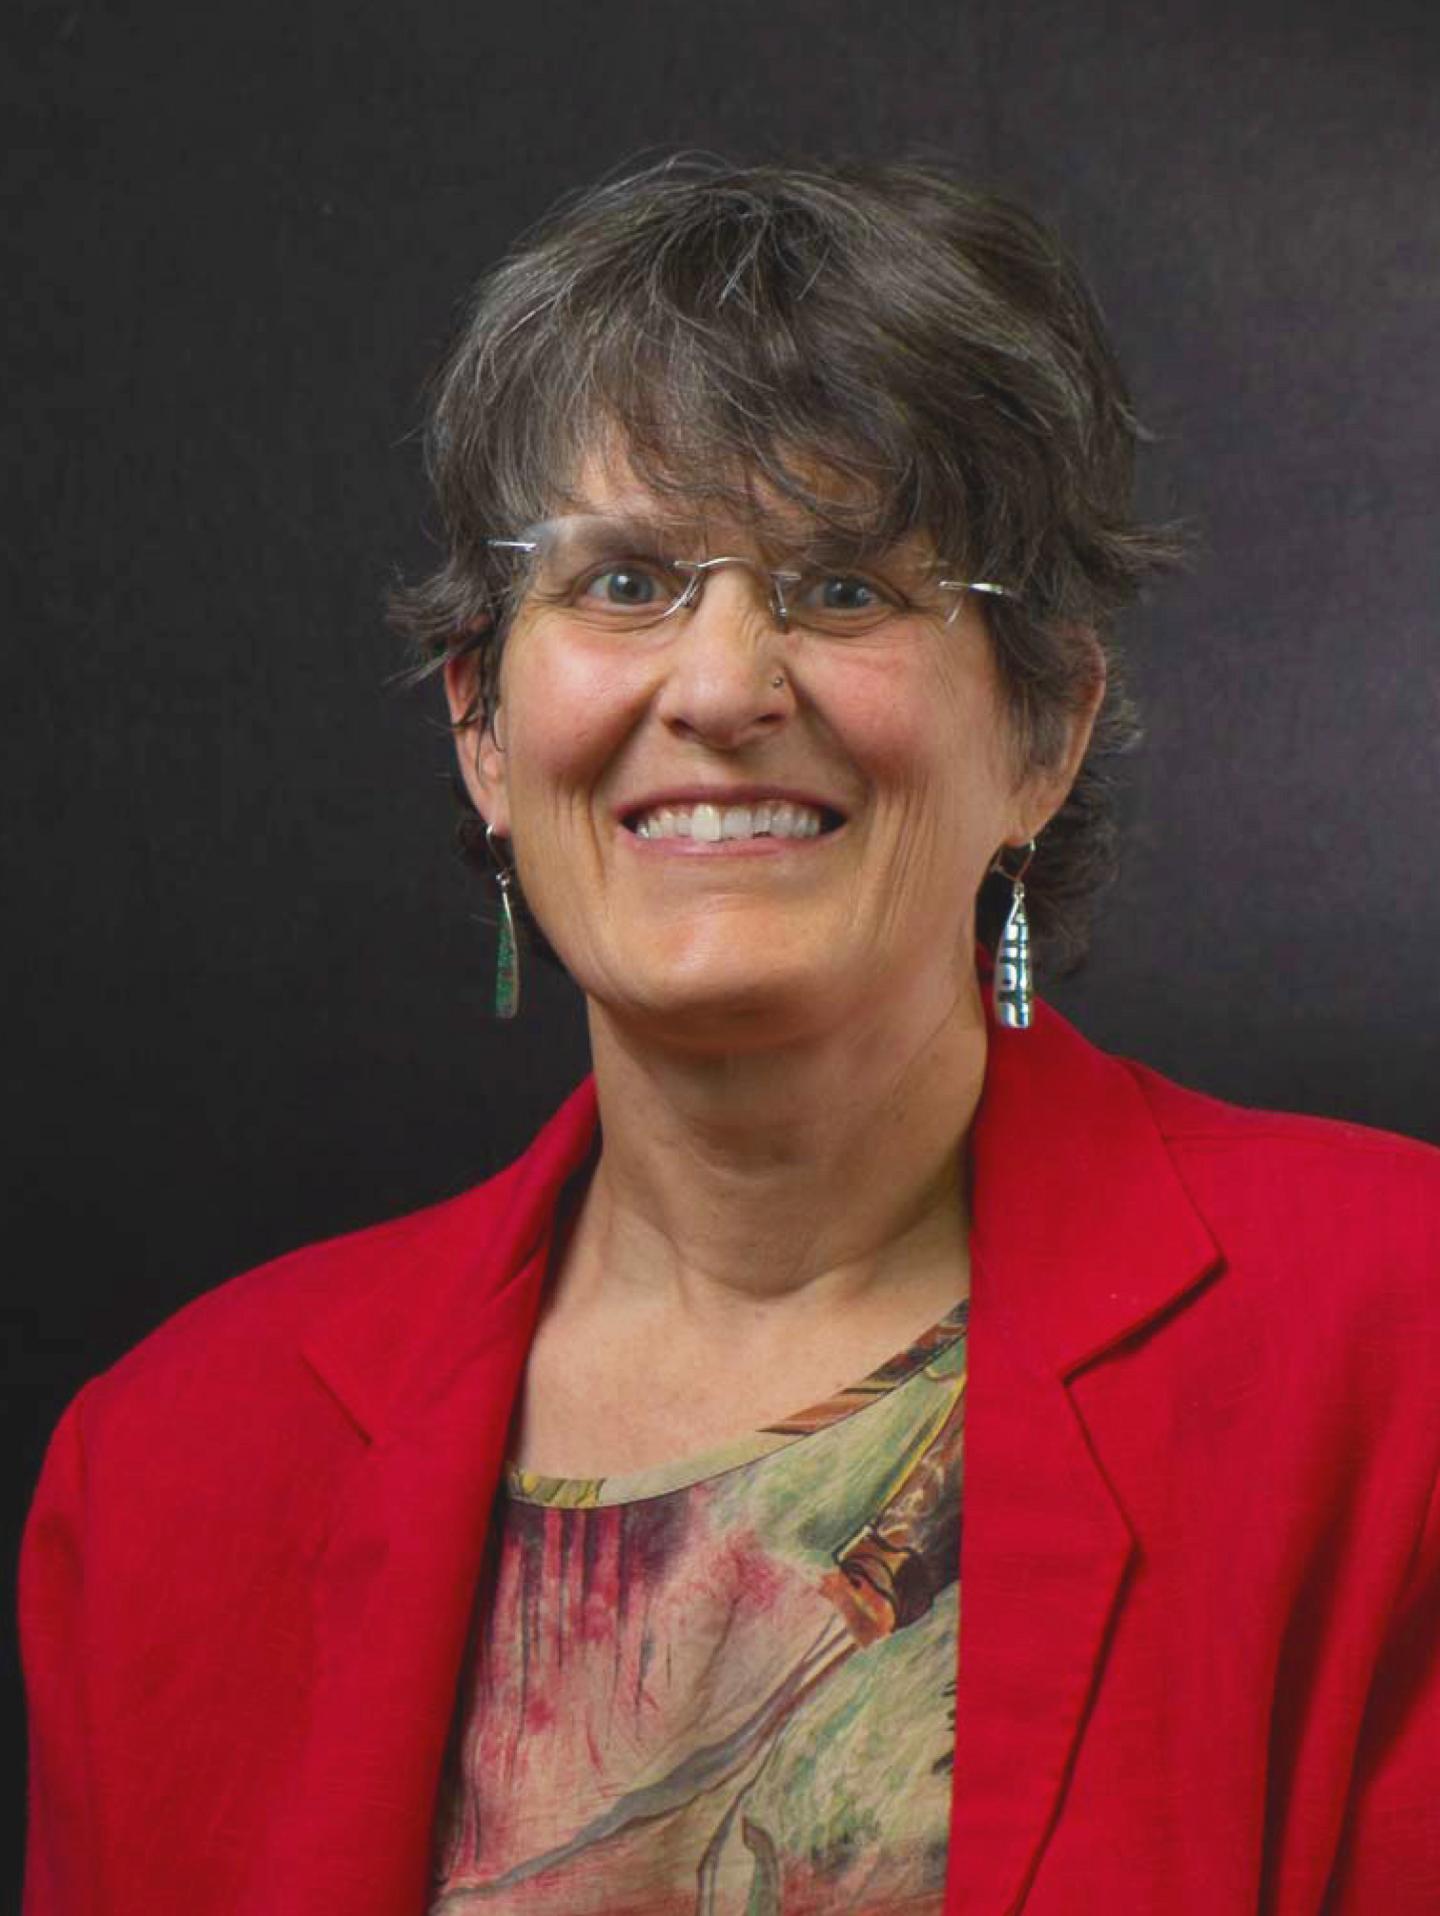 Jane McElroy, Ph.D., University of Missouri-Columbia